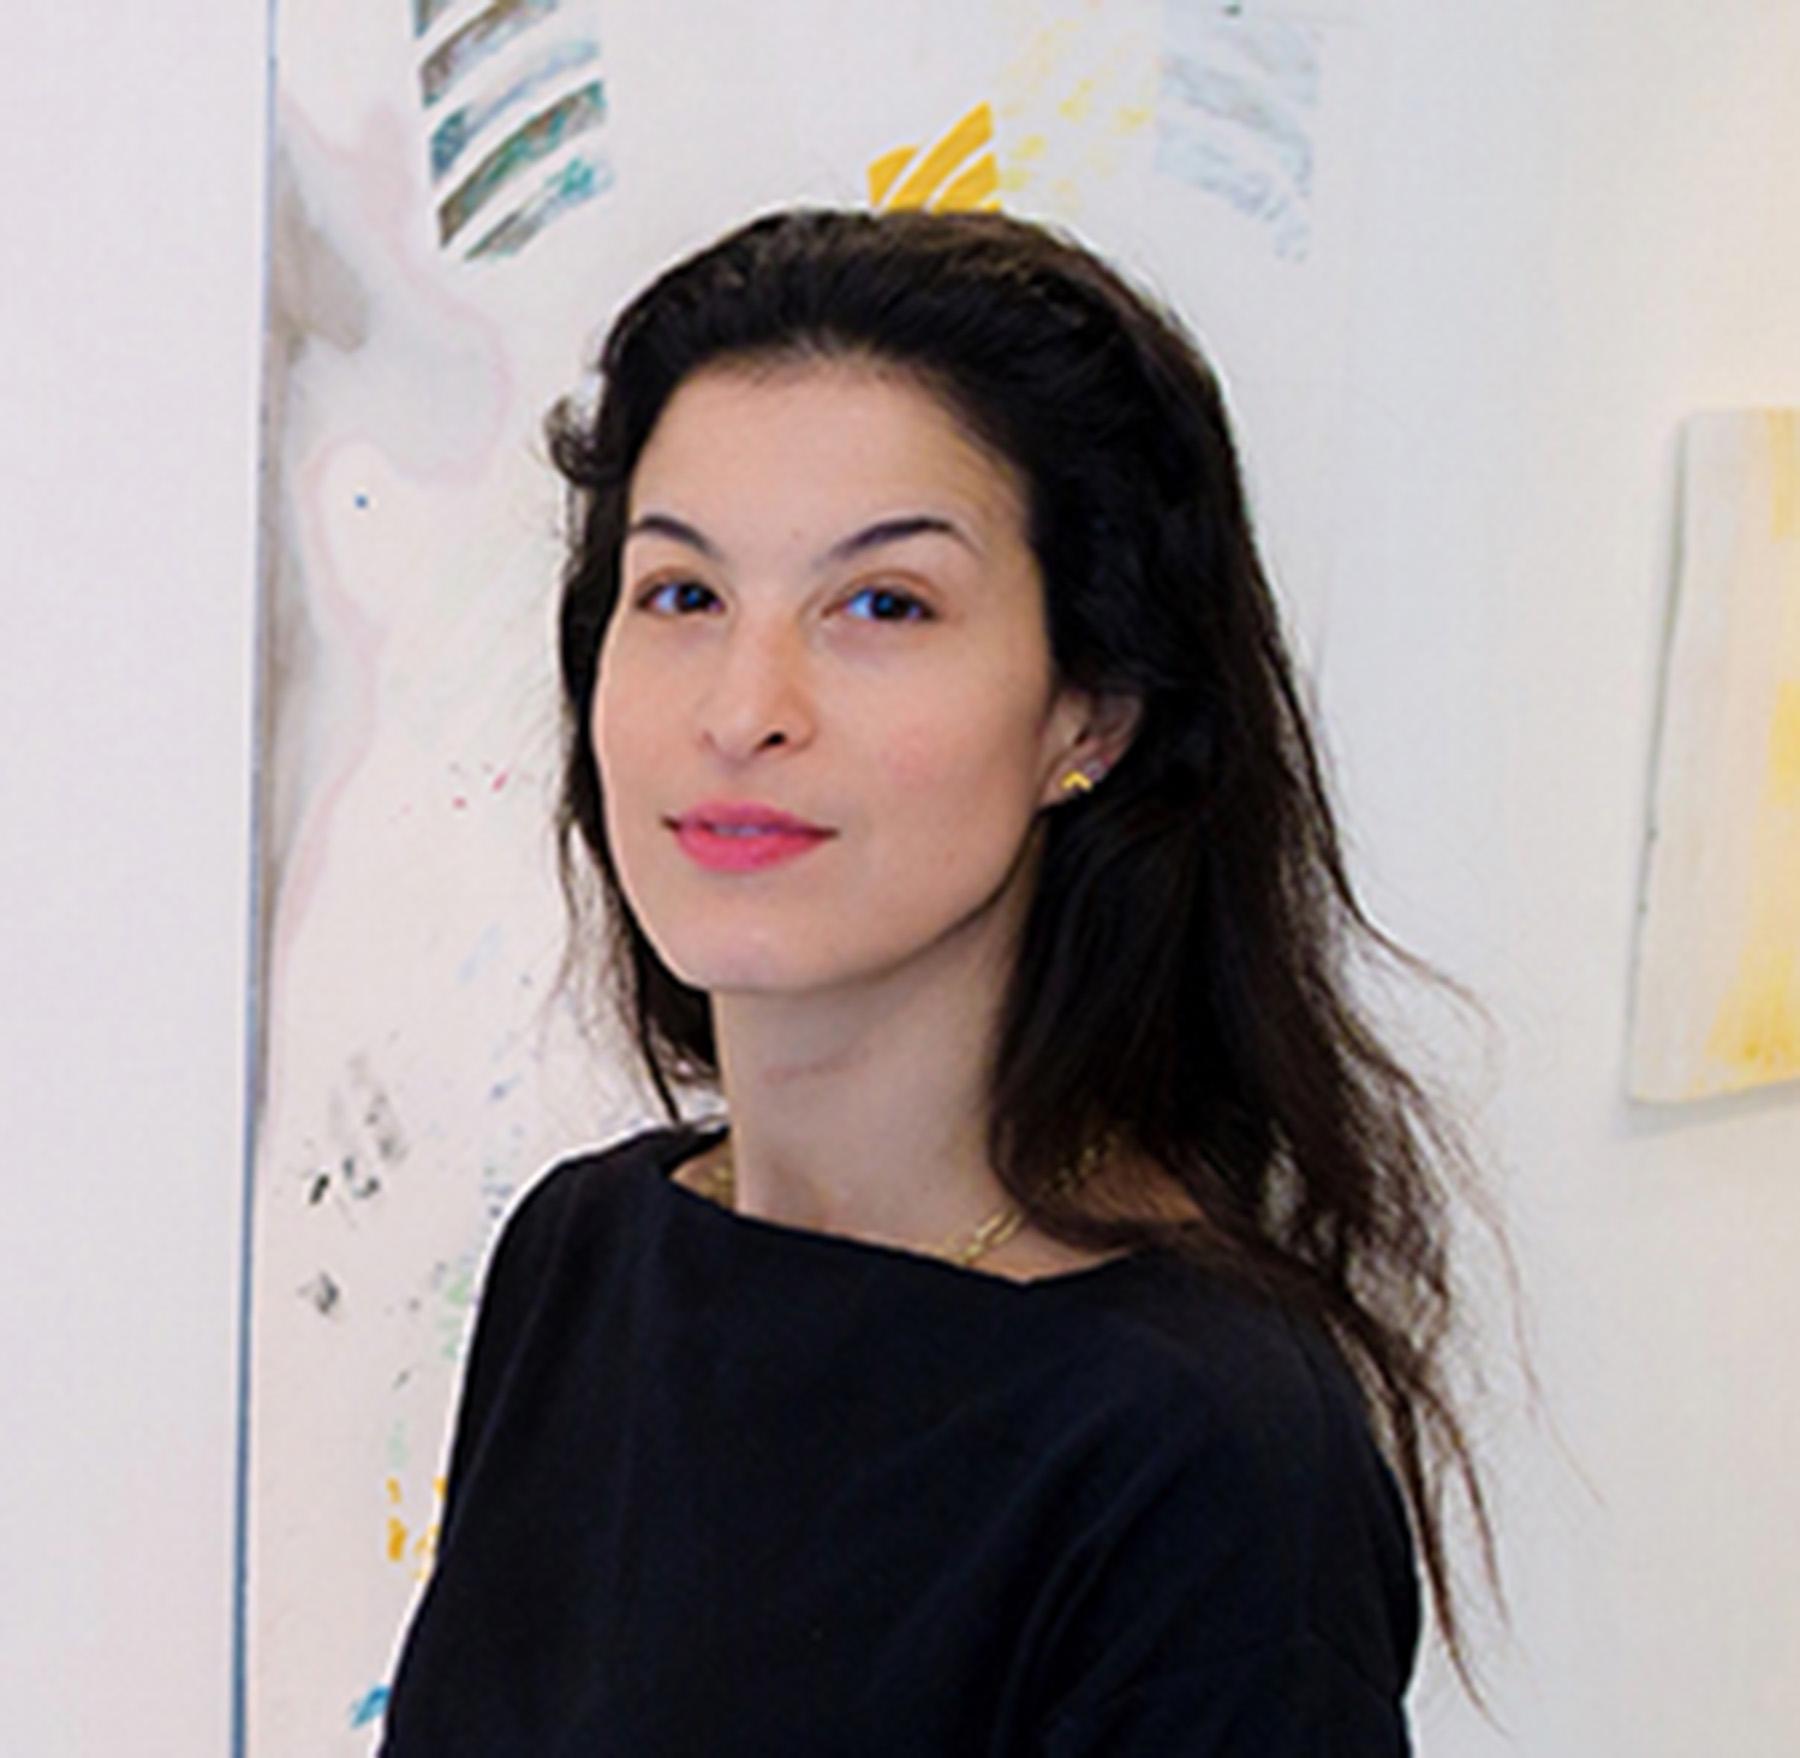 Emily Weiskopf